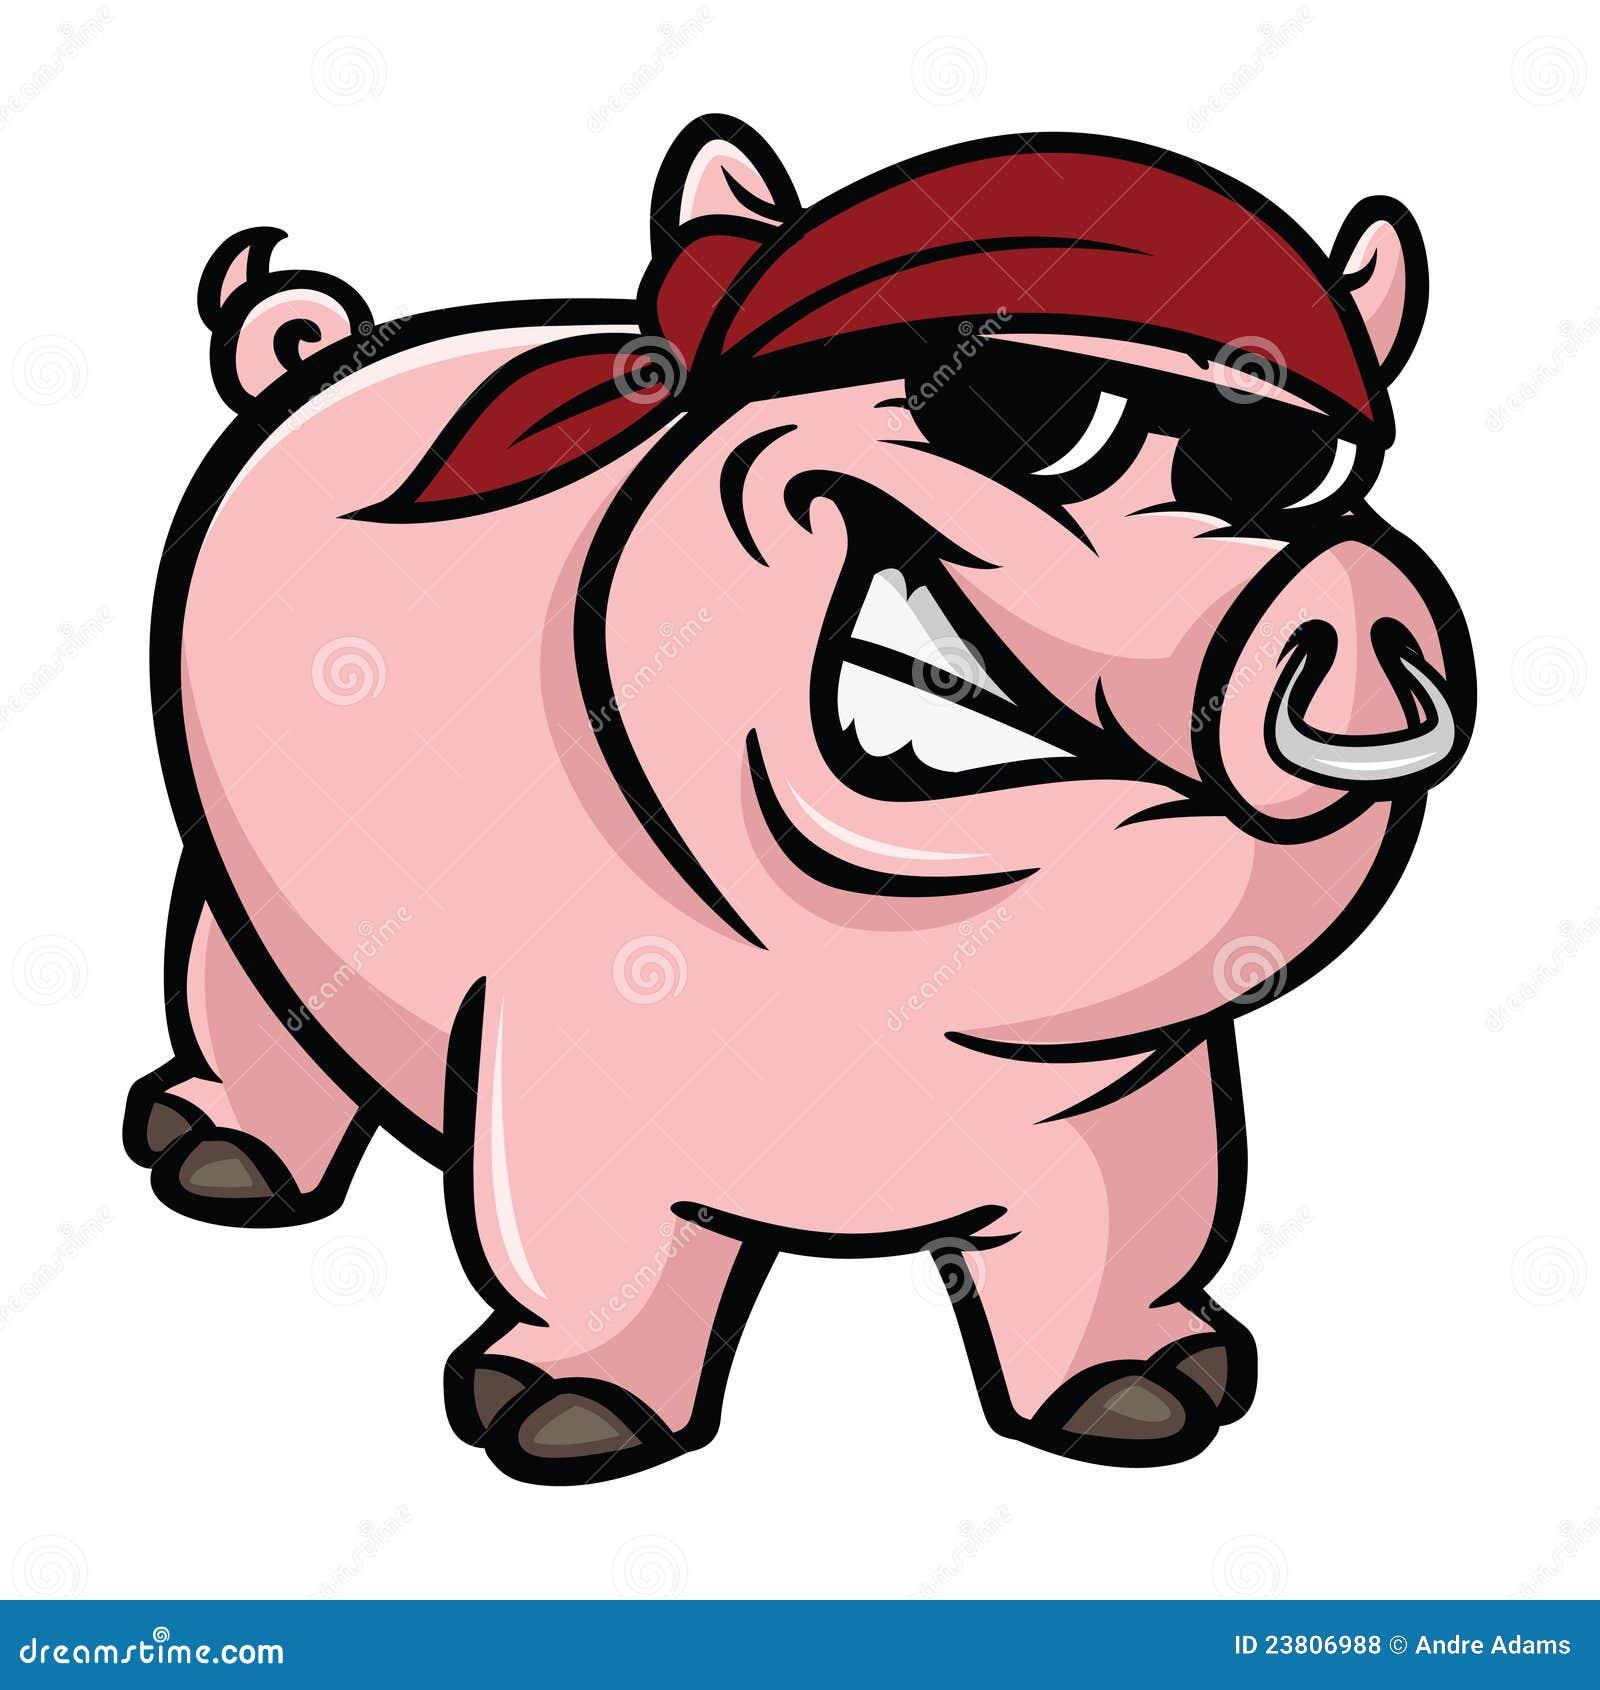 Hog ride splater